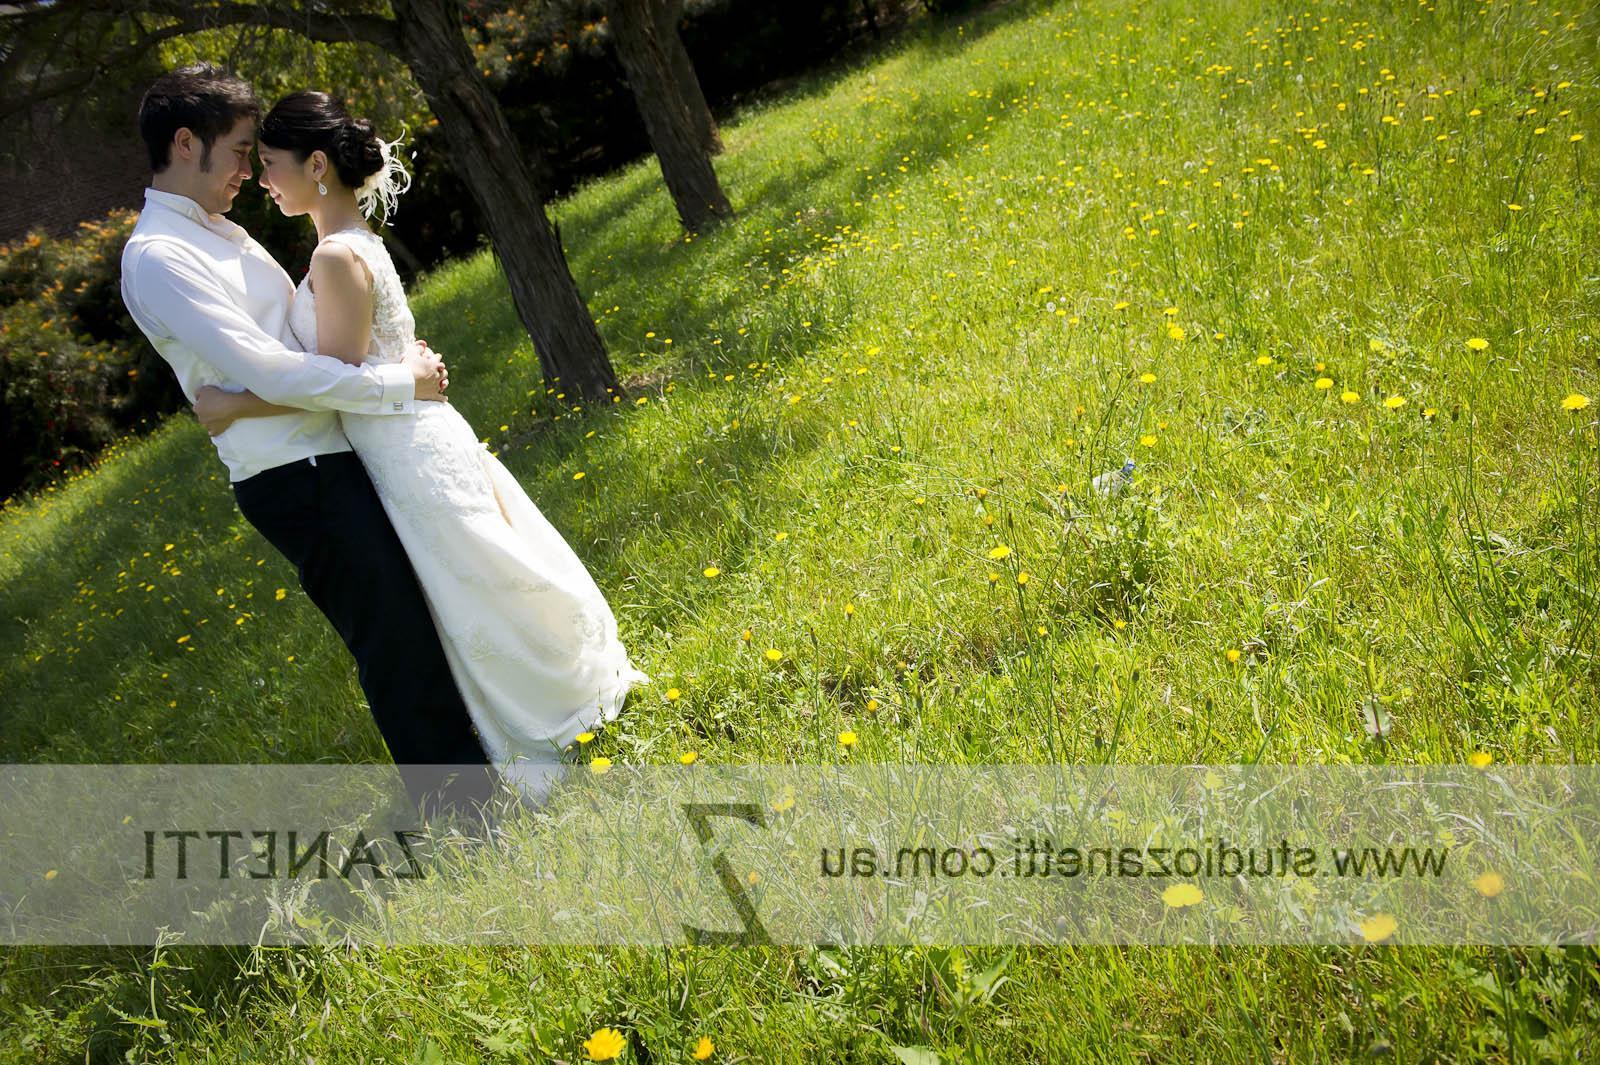 Read below for their wedding